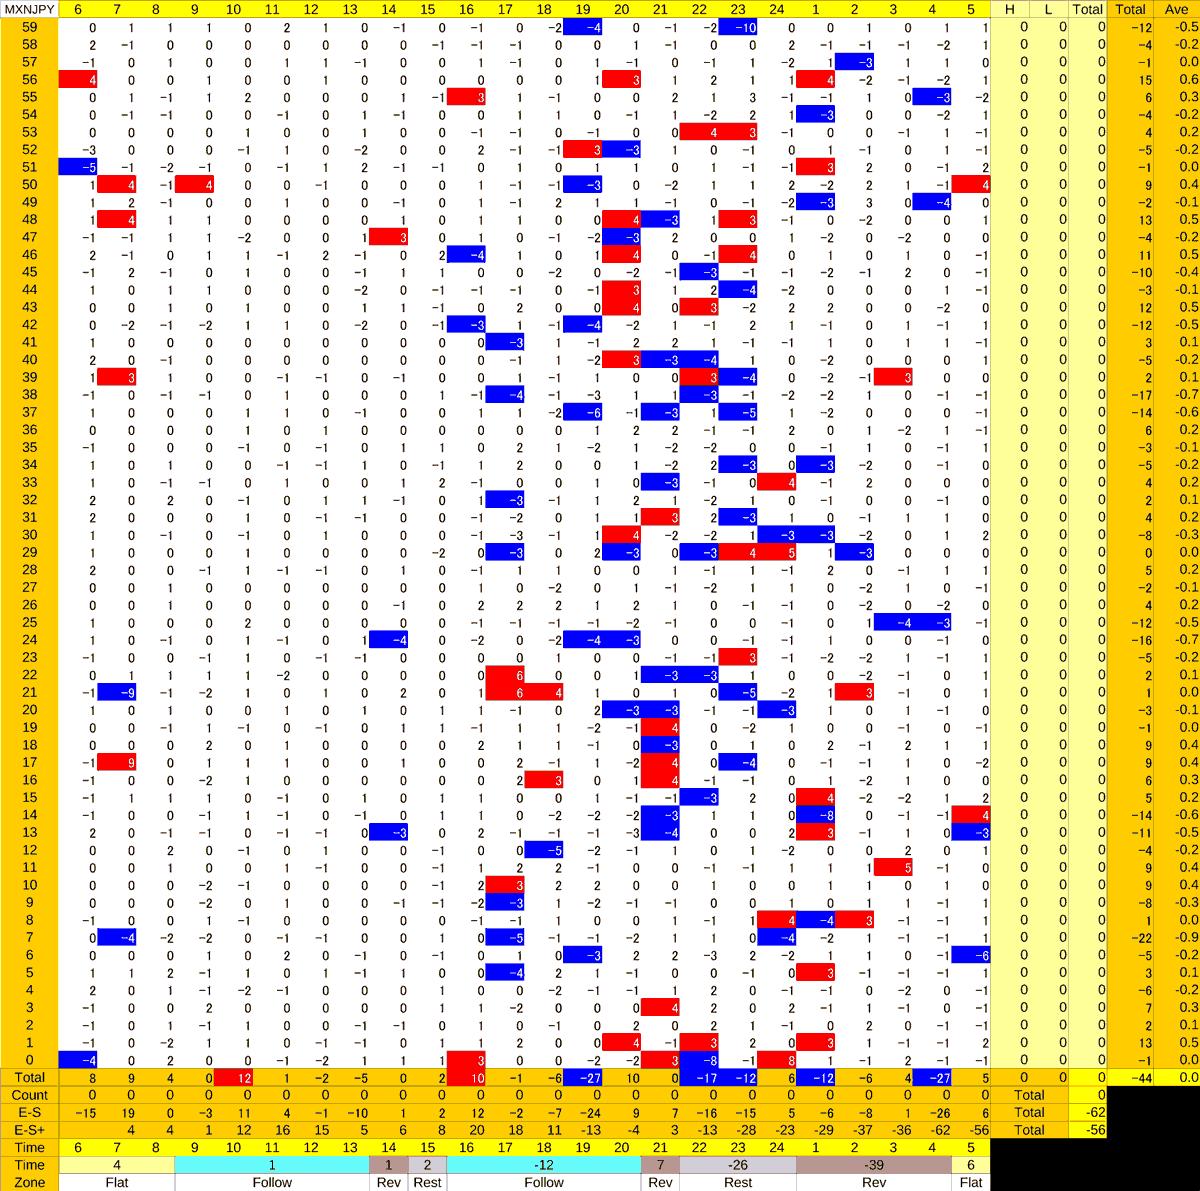 20210107_HS(3)MXNJPY